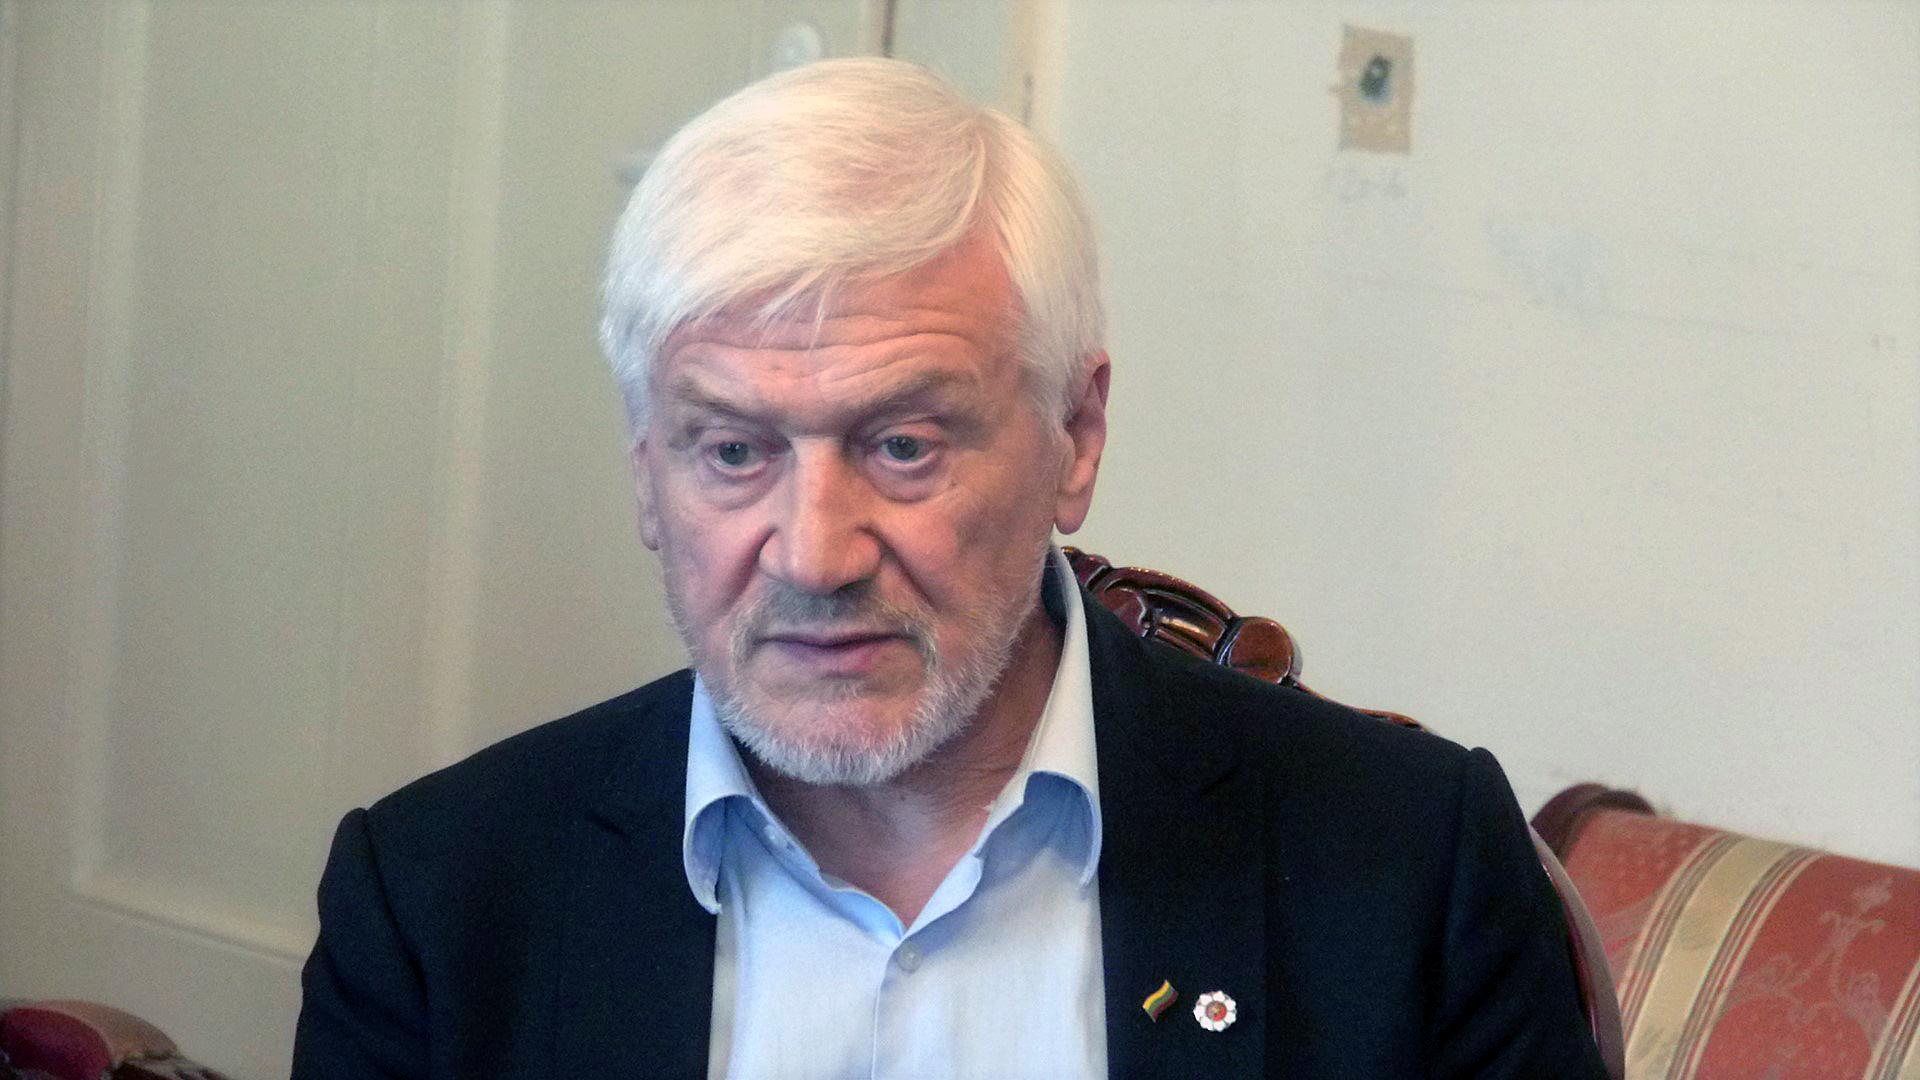 Jonas Vaitkus | Alkas.lt, J. Vaiškūno nuotr.